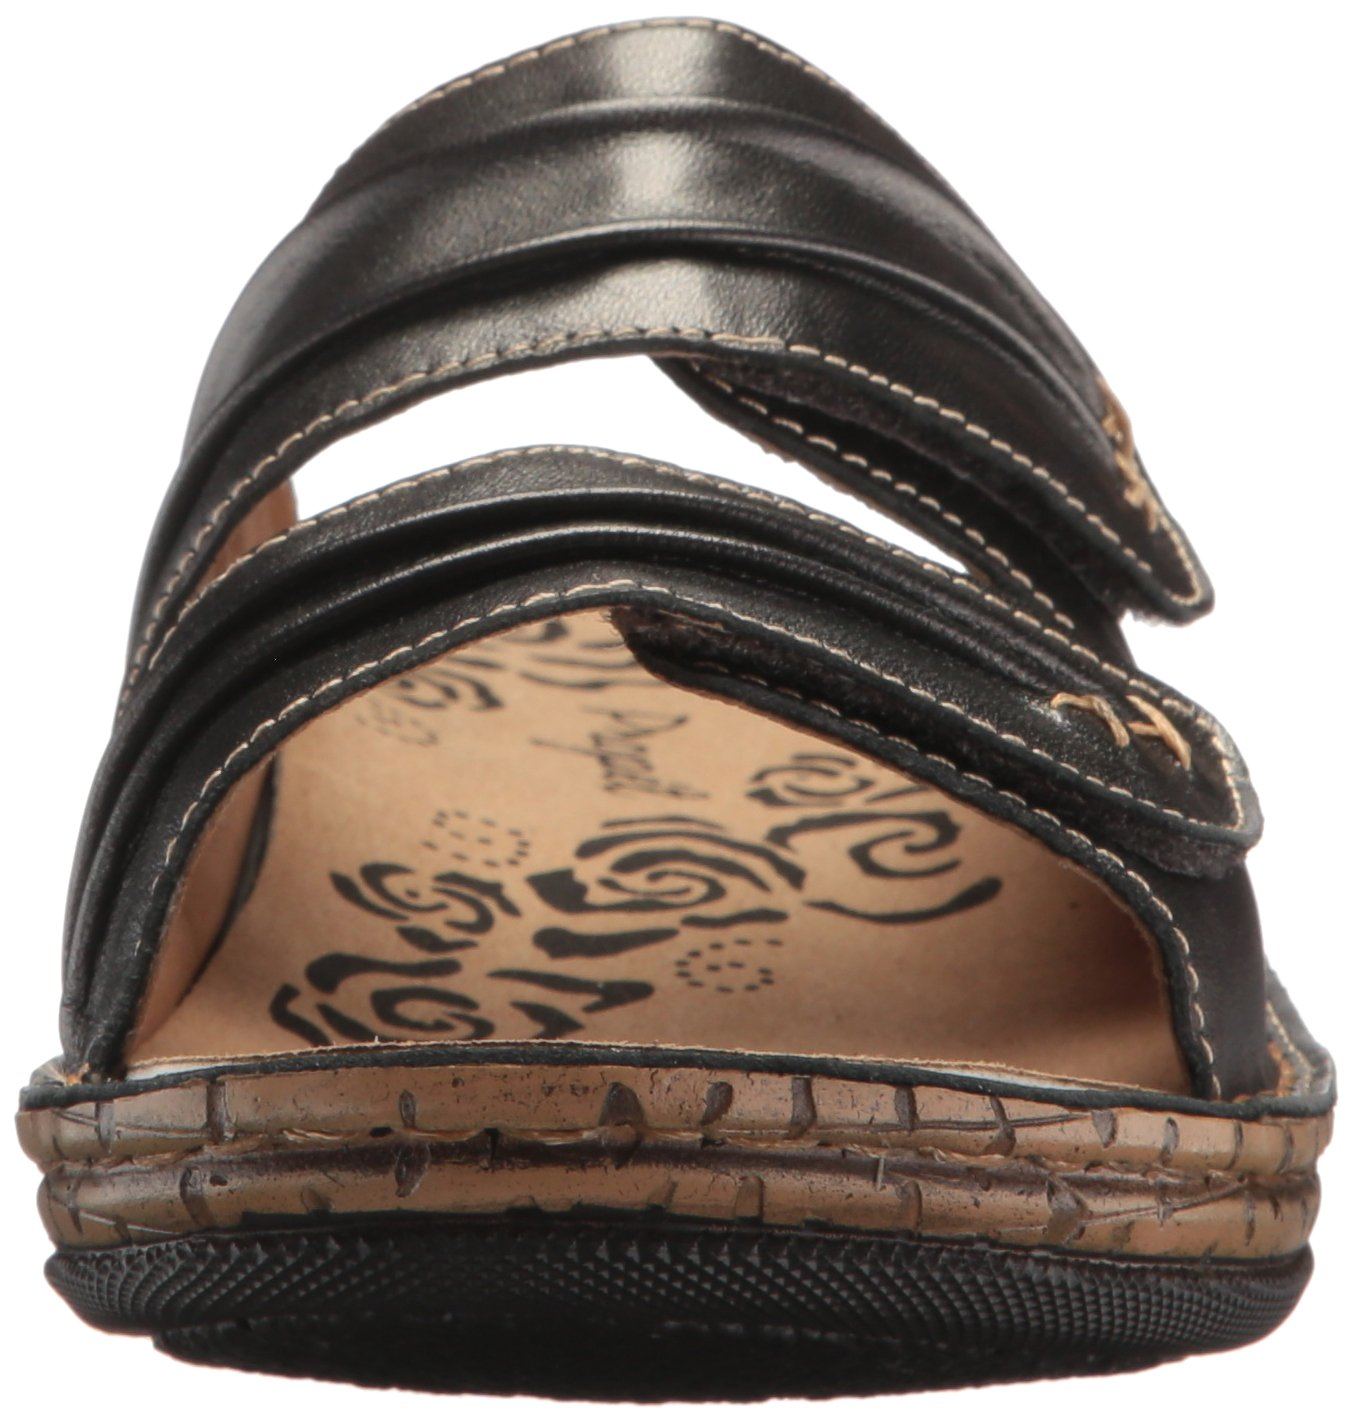 Propet Women's June Slide US|Silver Sandal B071JC3L22 7.5 2E US|Silver Slide 5f9582